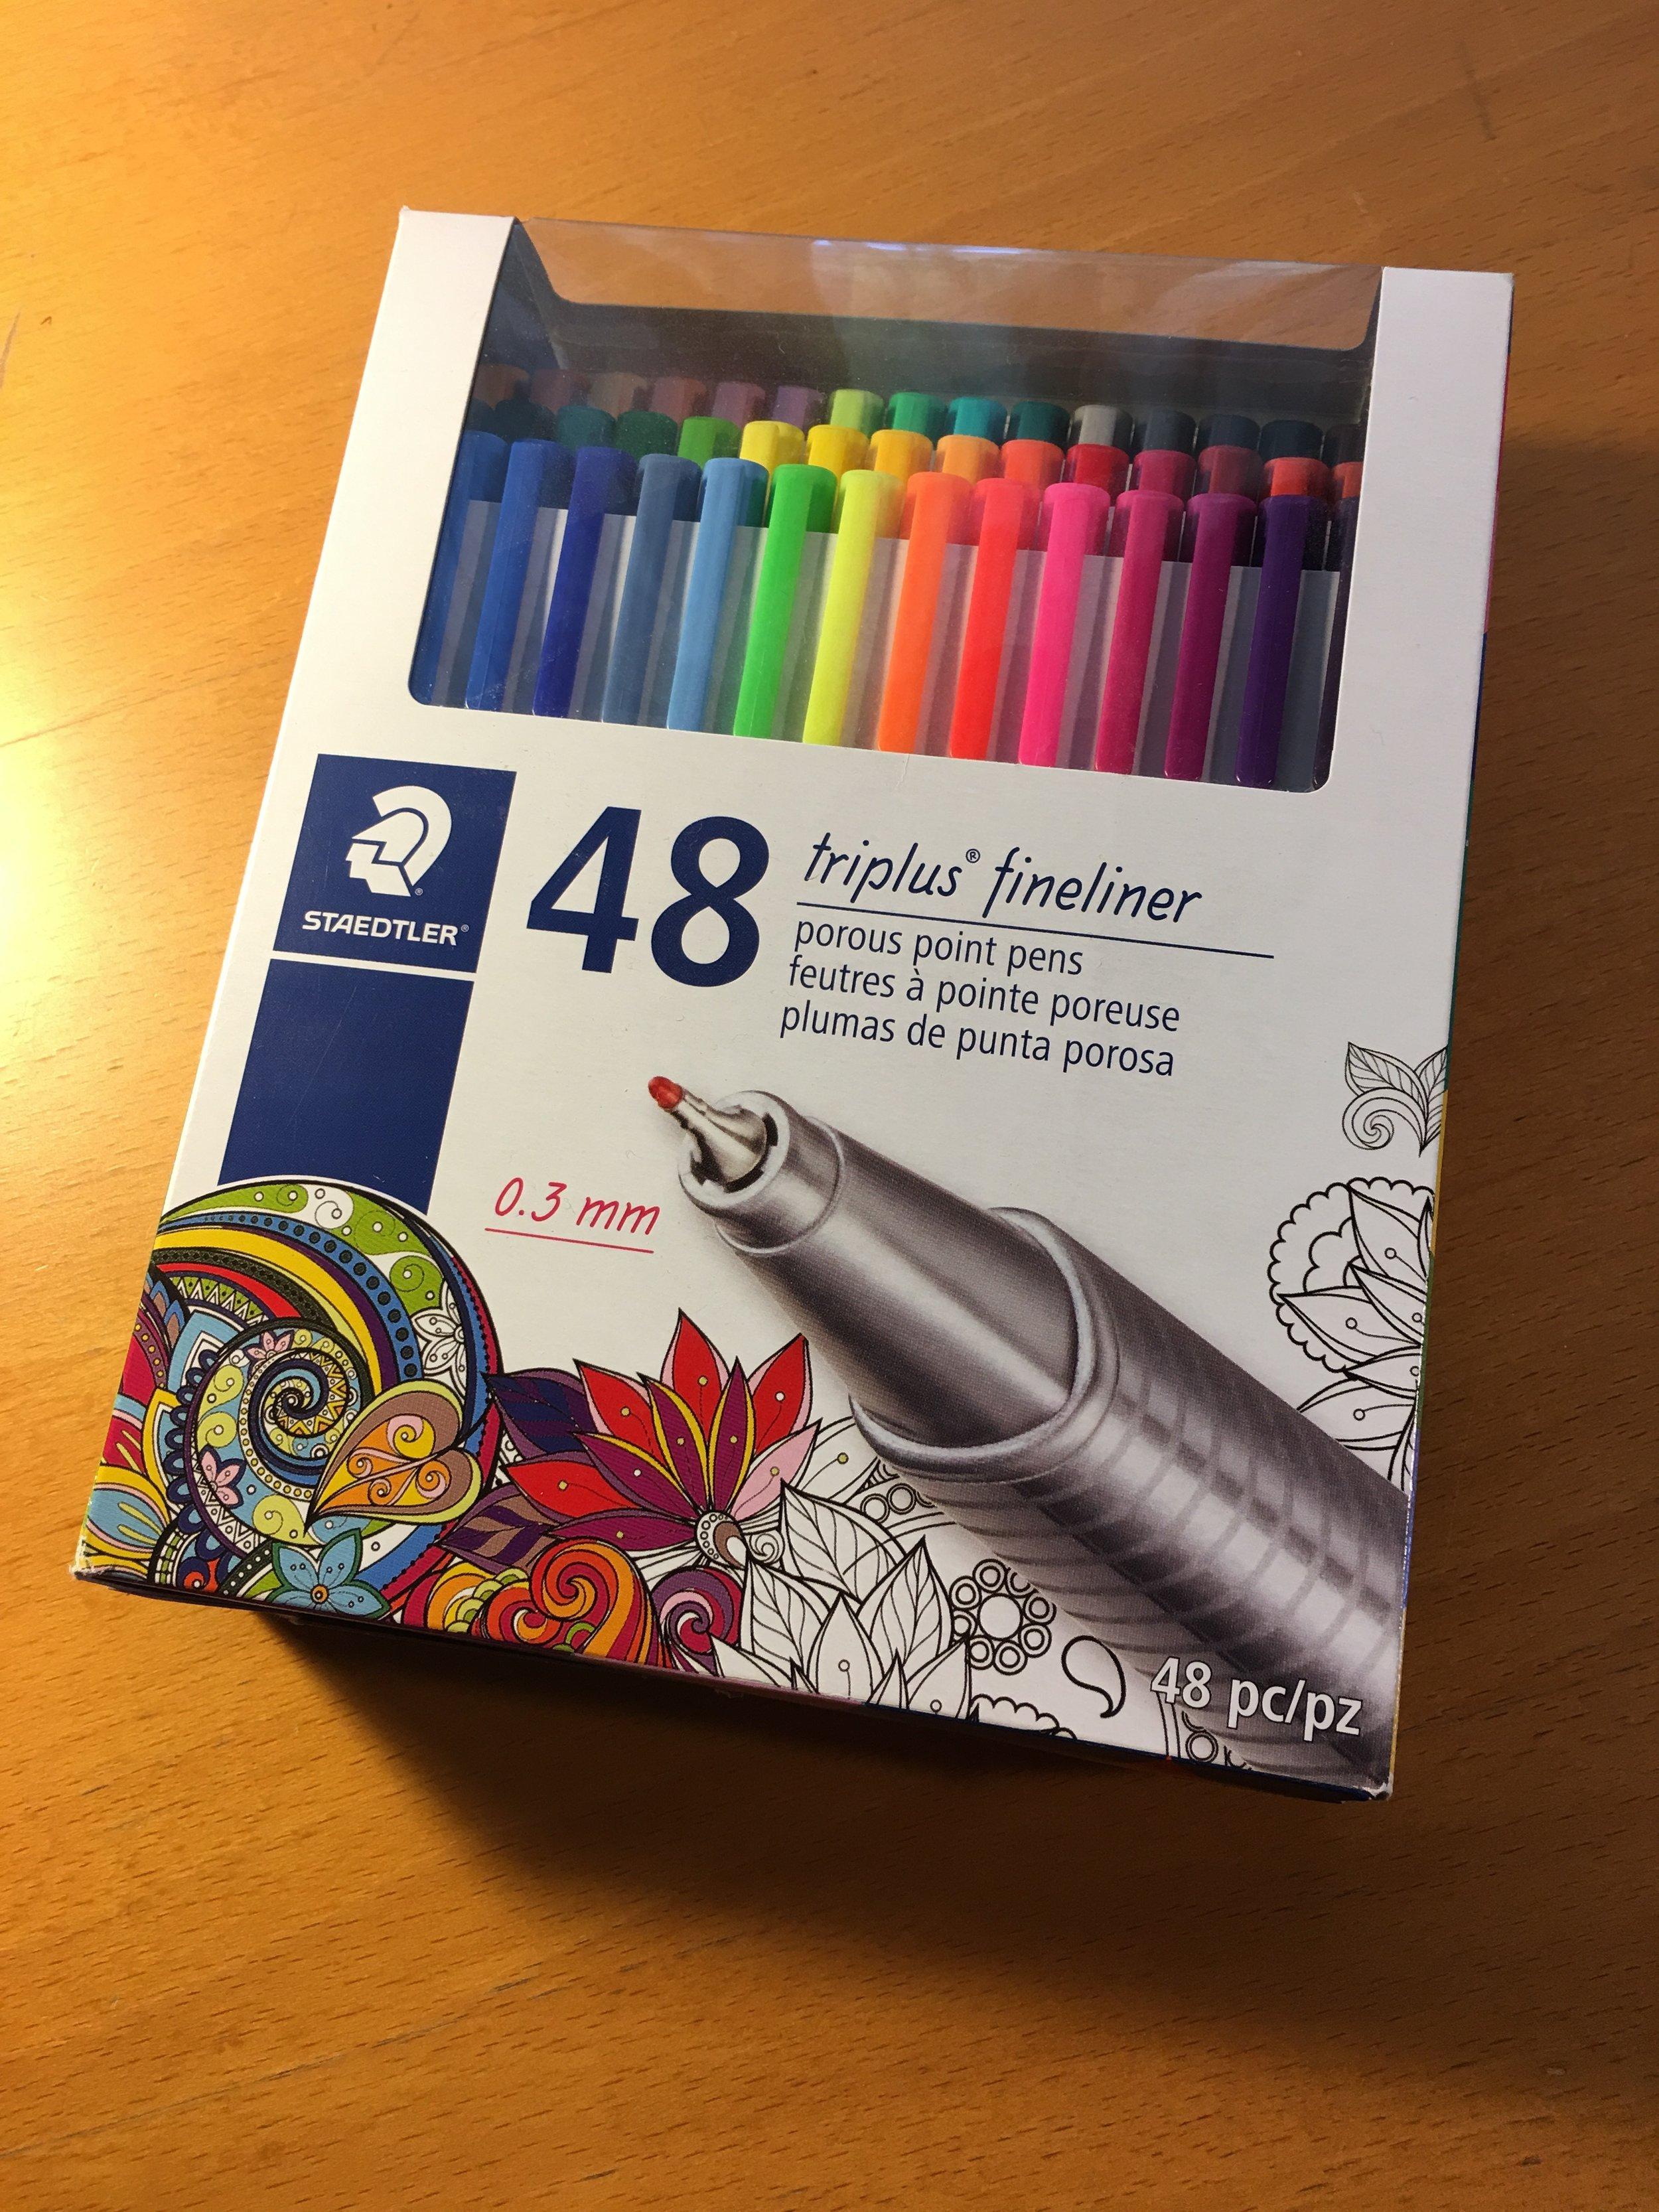 48 fineliner pen set.JPG